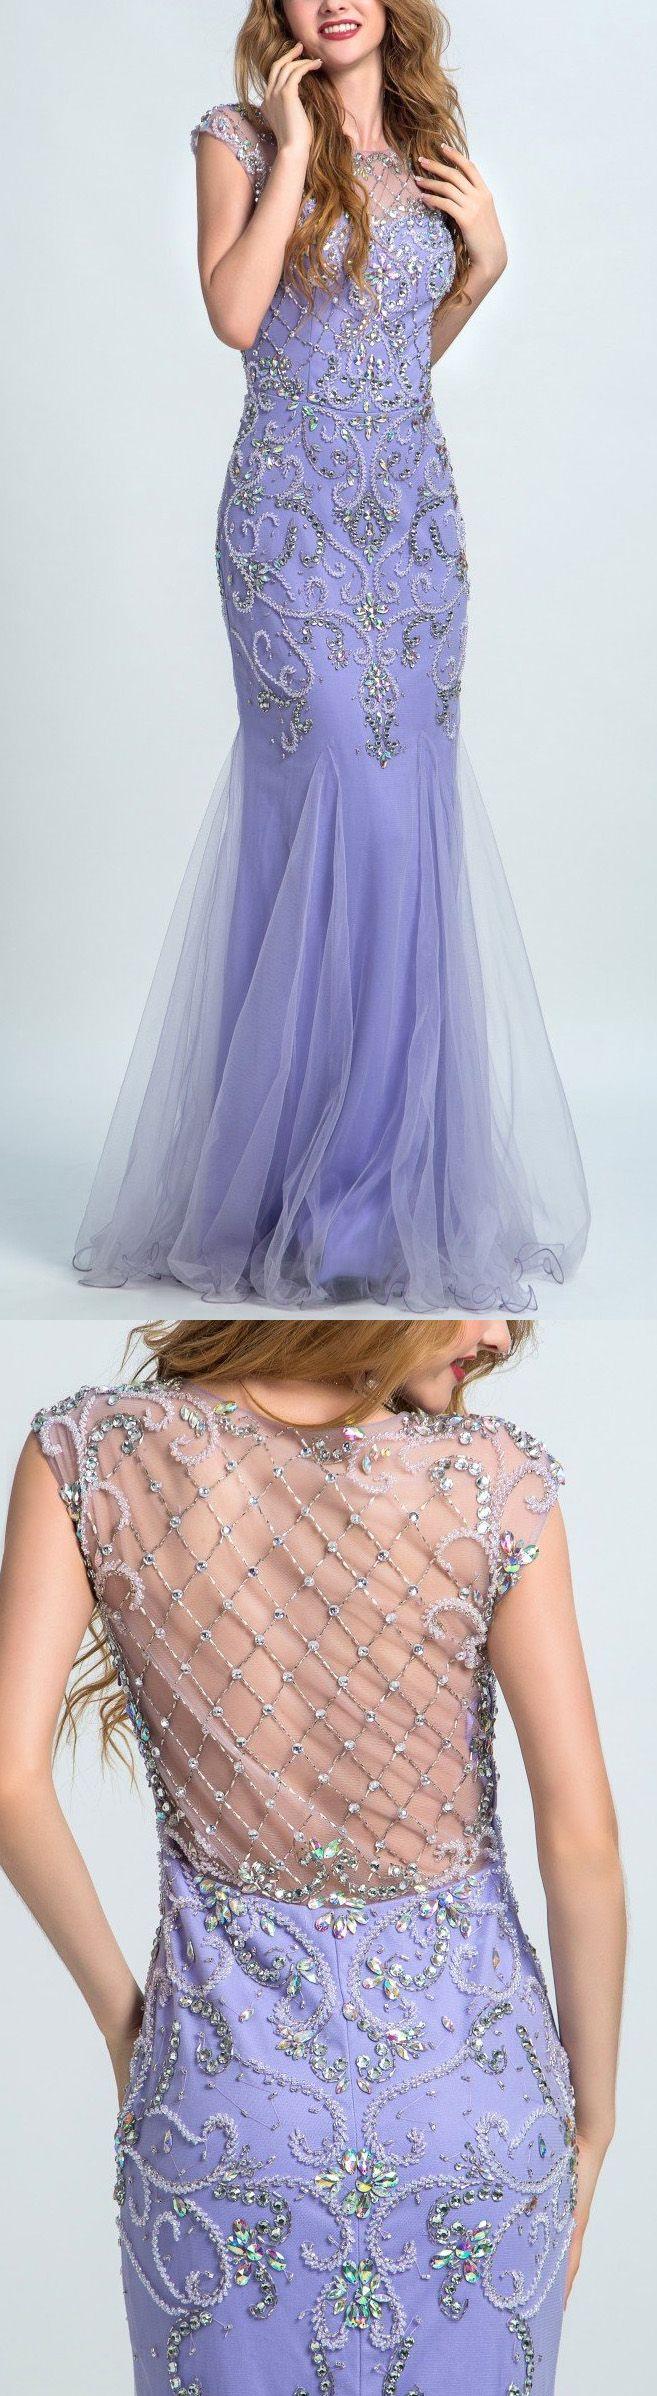 5097 best Vestidos de fiesta images on Pinterest | Party outfits ...